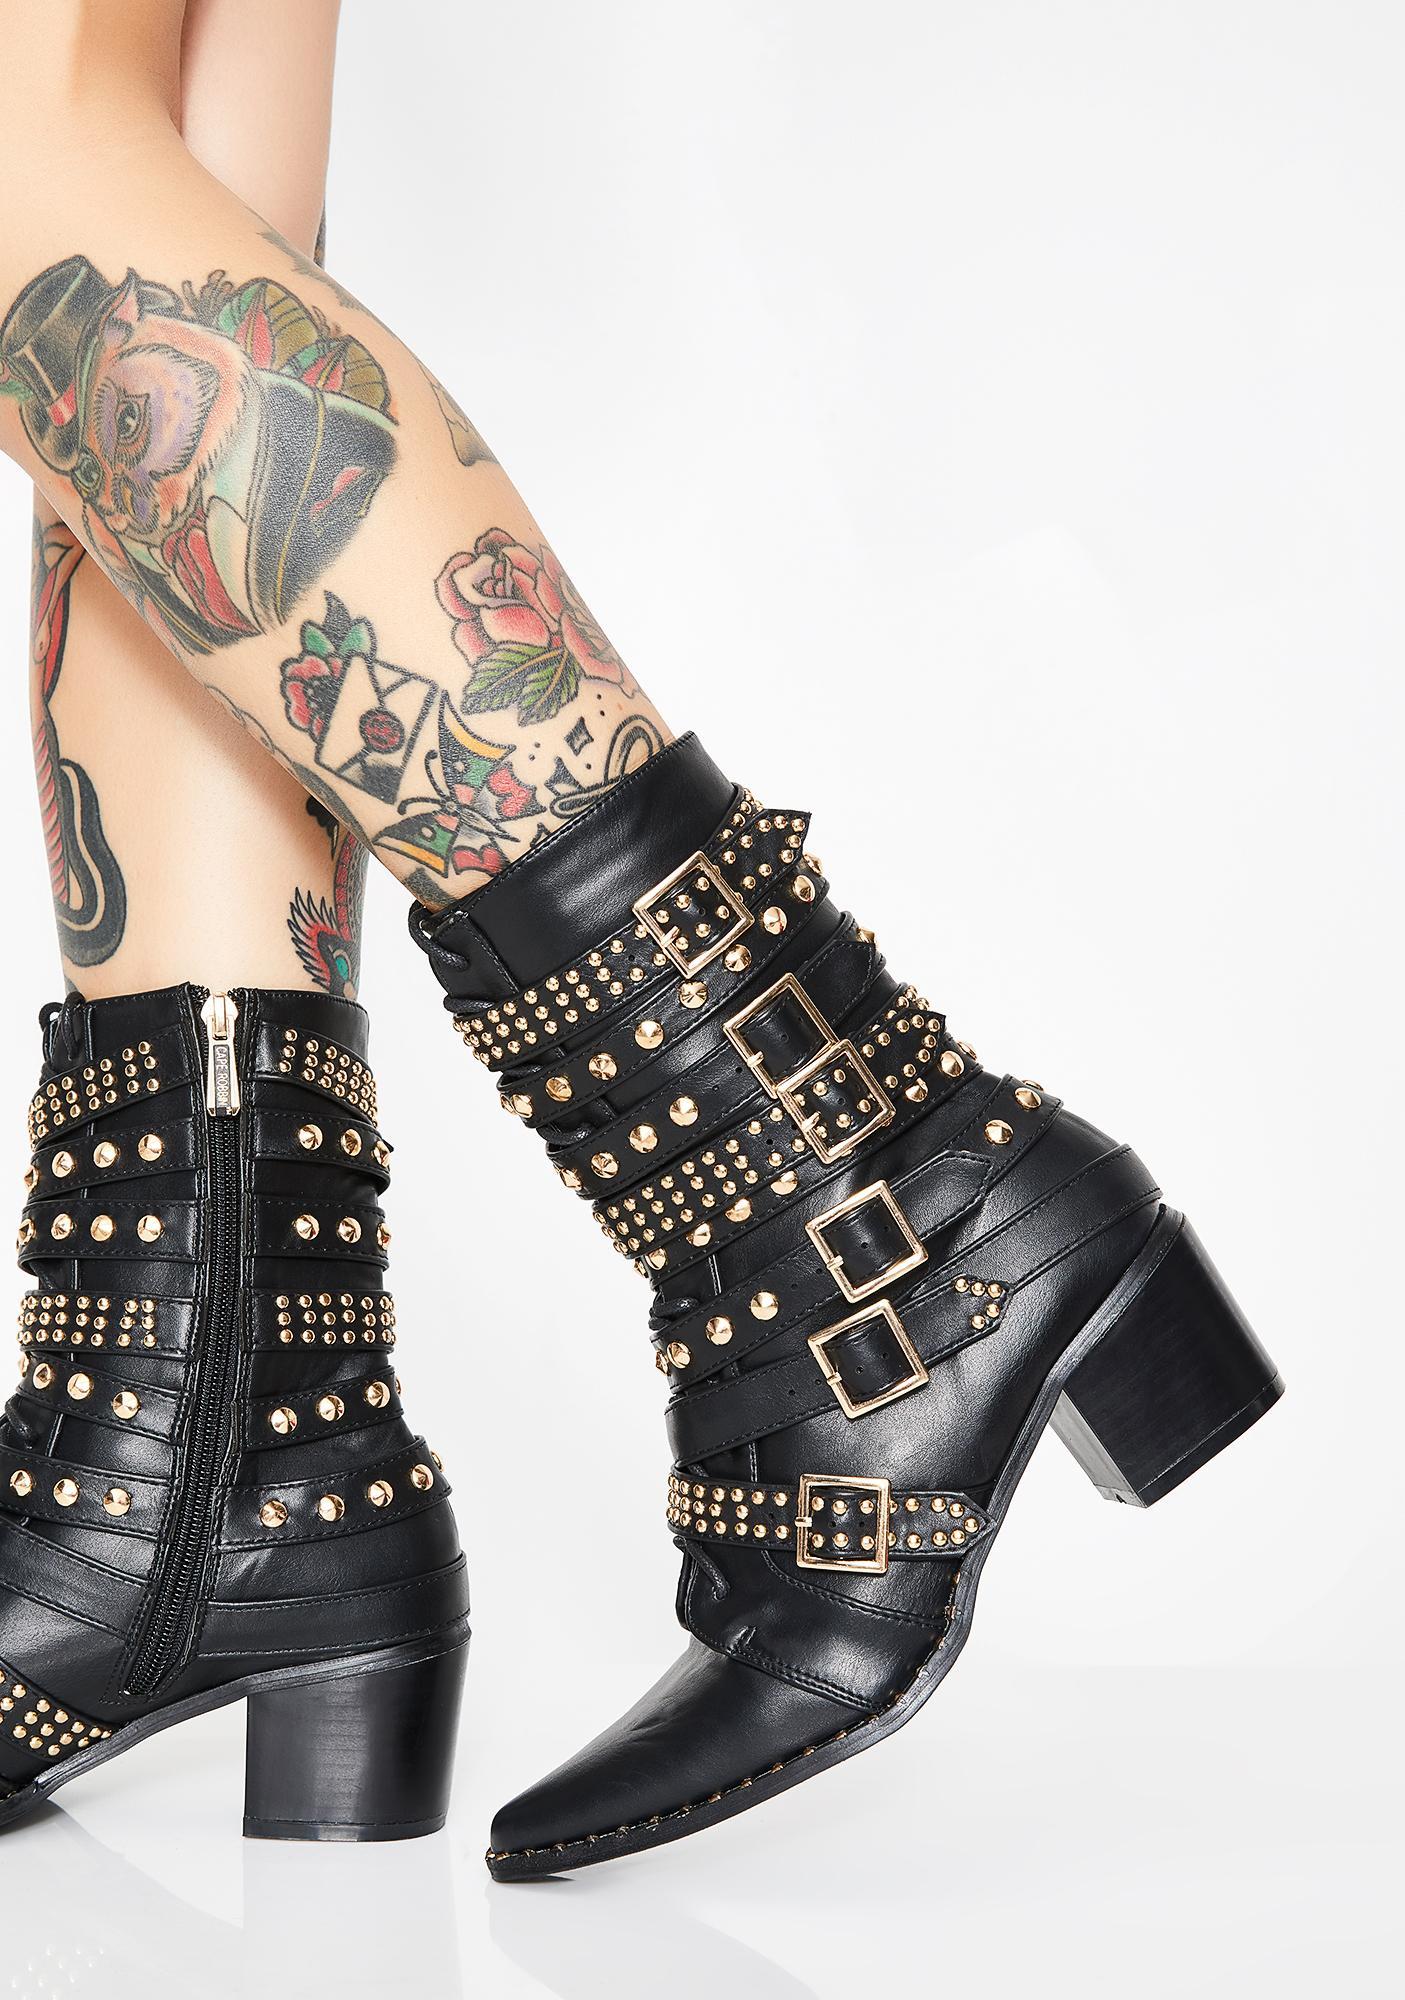 Onyx Rockstar Tendencies Studded Boots